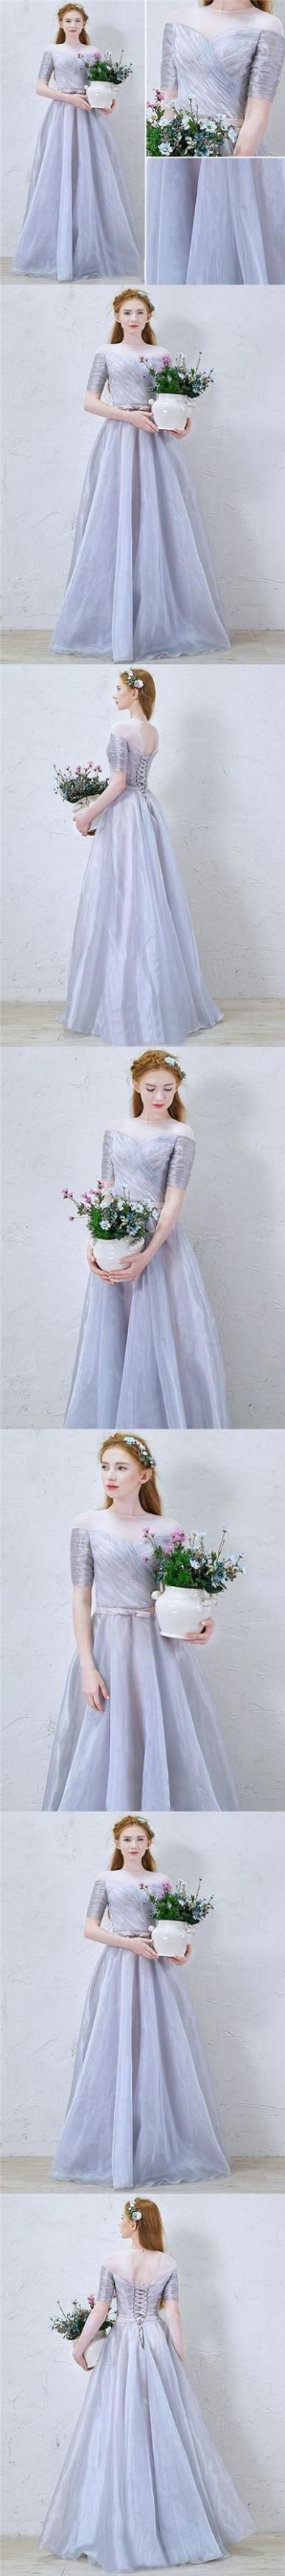 Chic prom dresses scoop aline floorlength silver organza prom